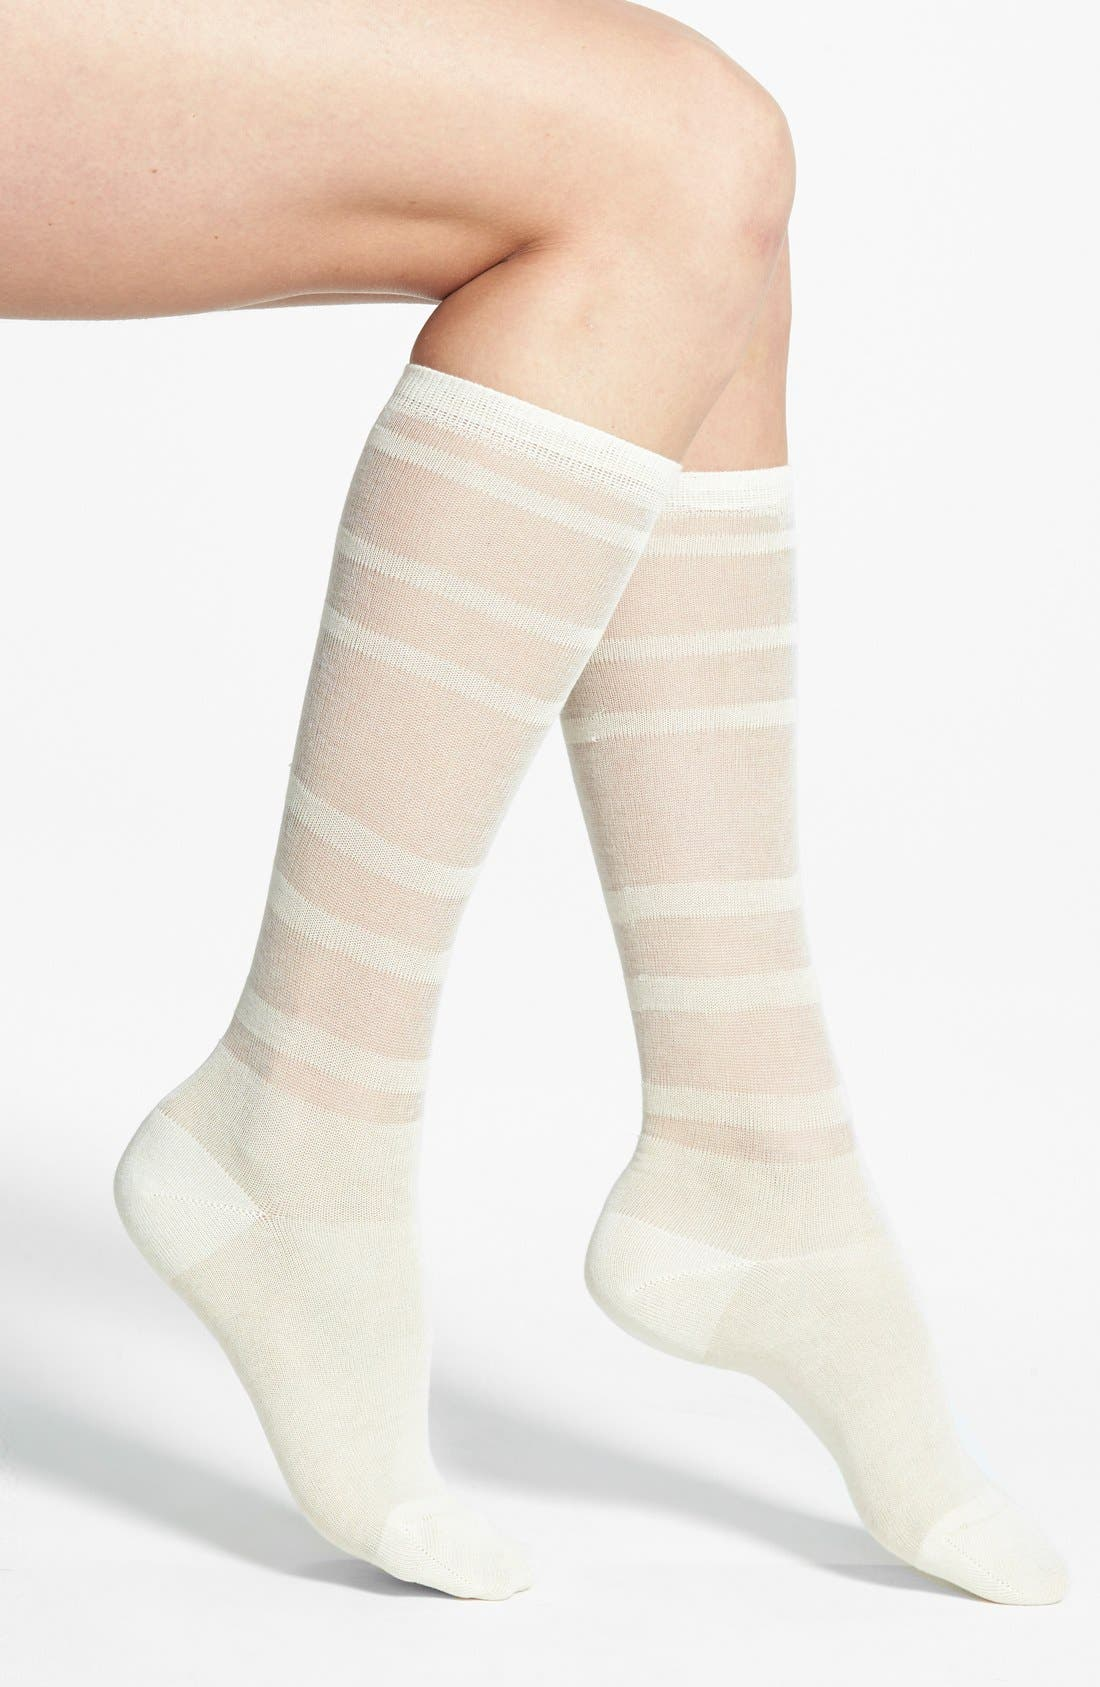 Main Image - Oroblu 'Calzino Nellie' Sheer Stripe Trouser Socks